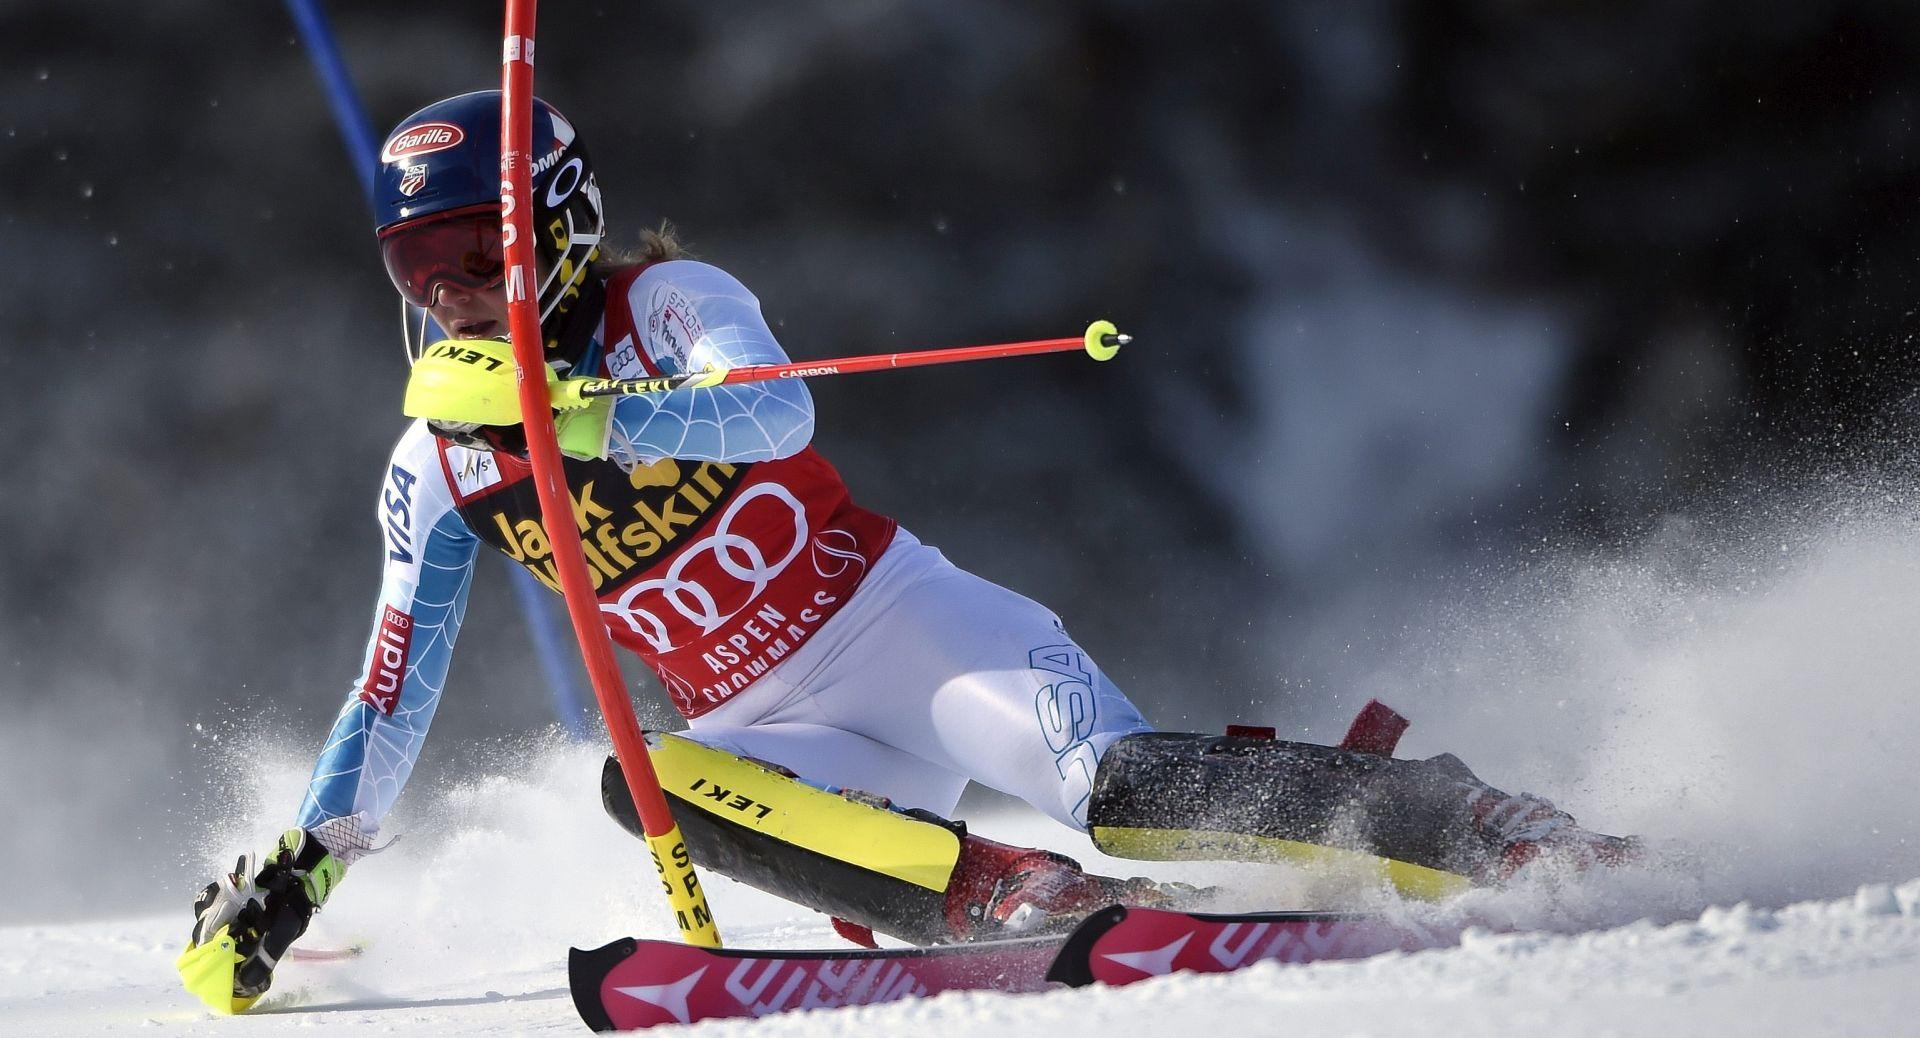 SVJETSKI KUP: Shiffrin slavila na slalomu u Aspenu